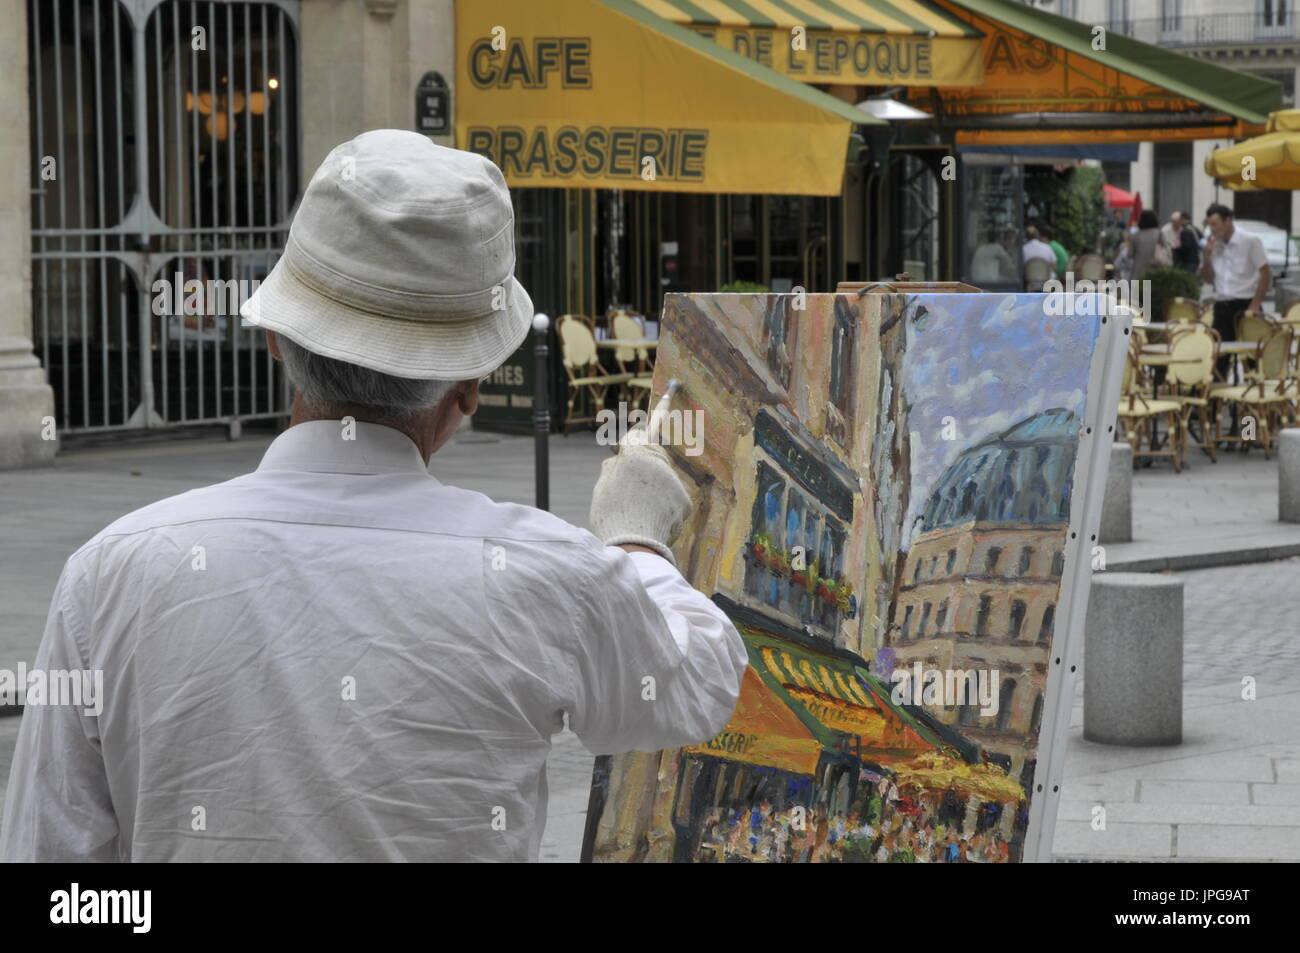 a street observation